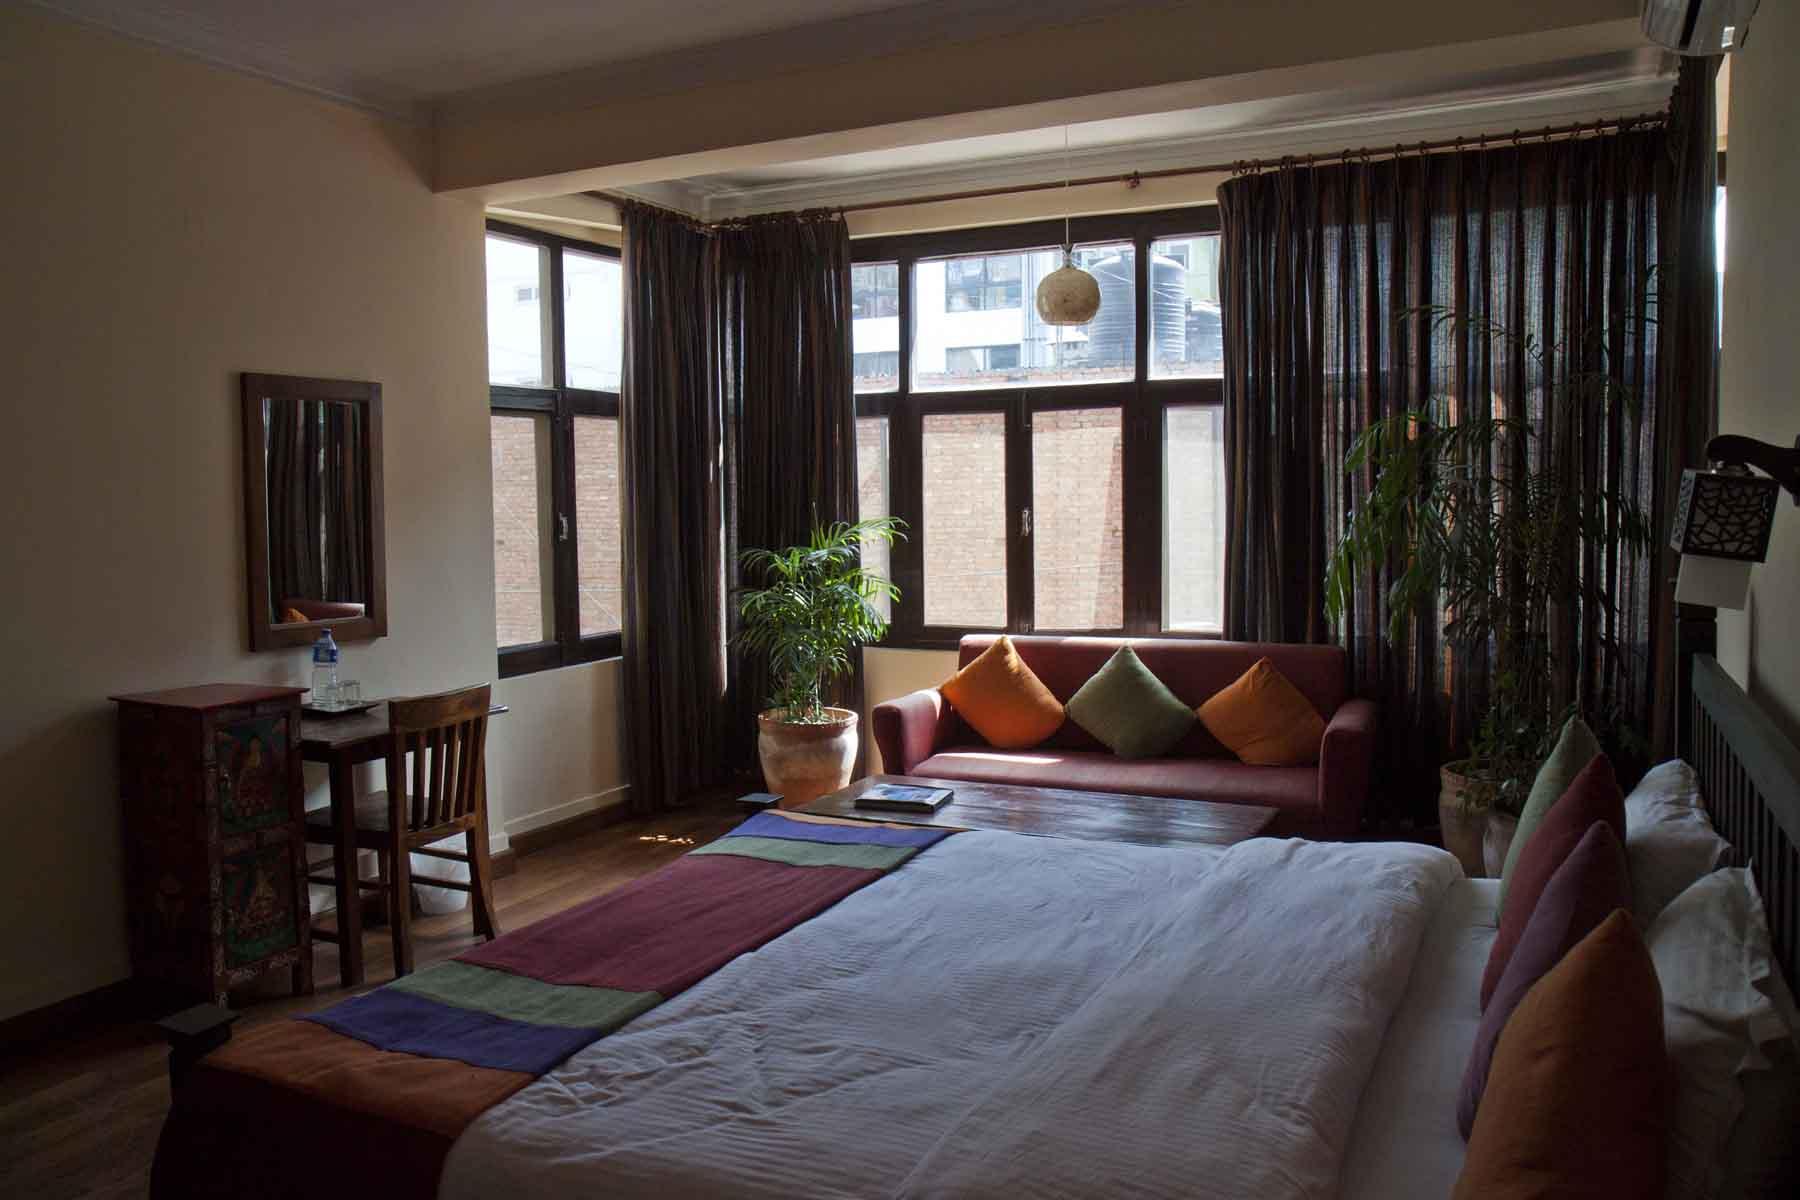 Mt Annapurna room in Hotel Mi Casa, Thamel, Kathmandu